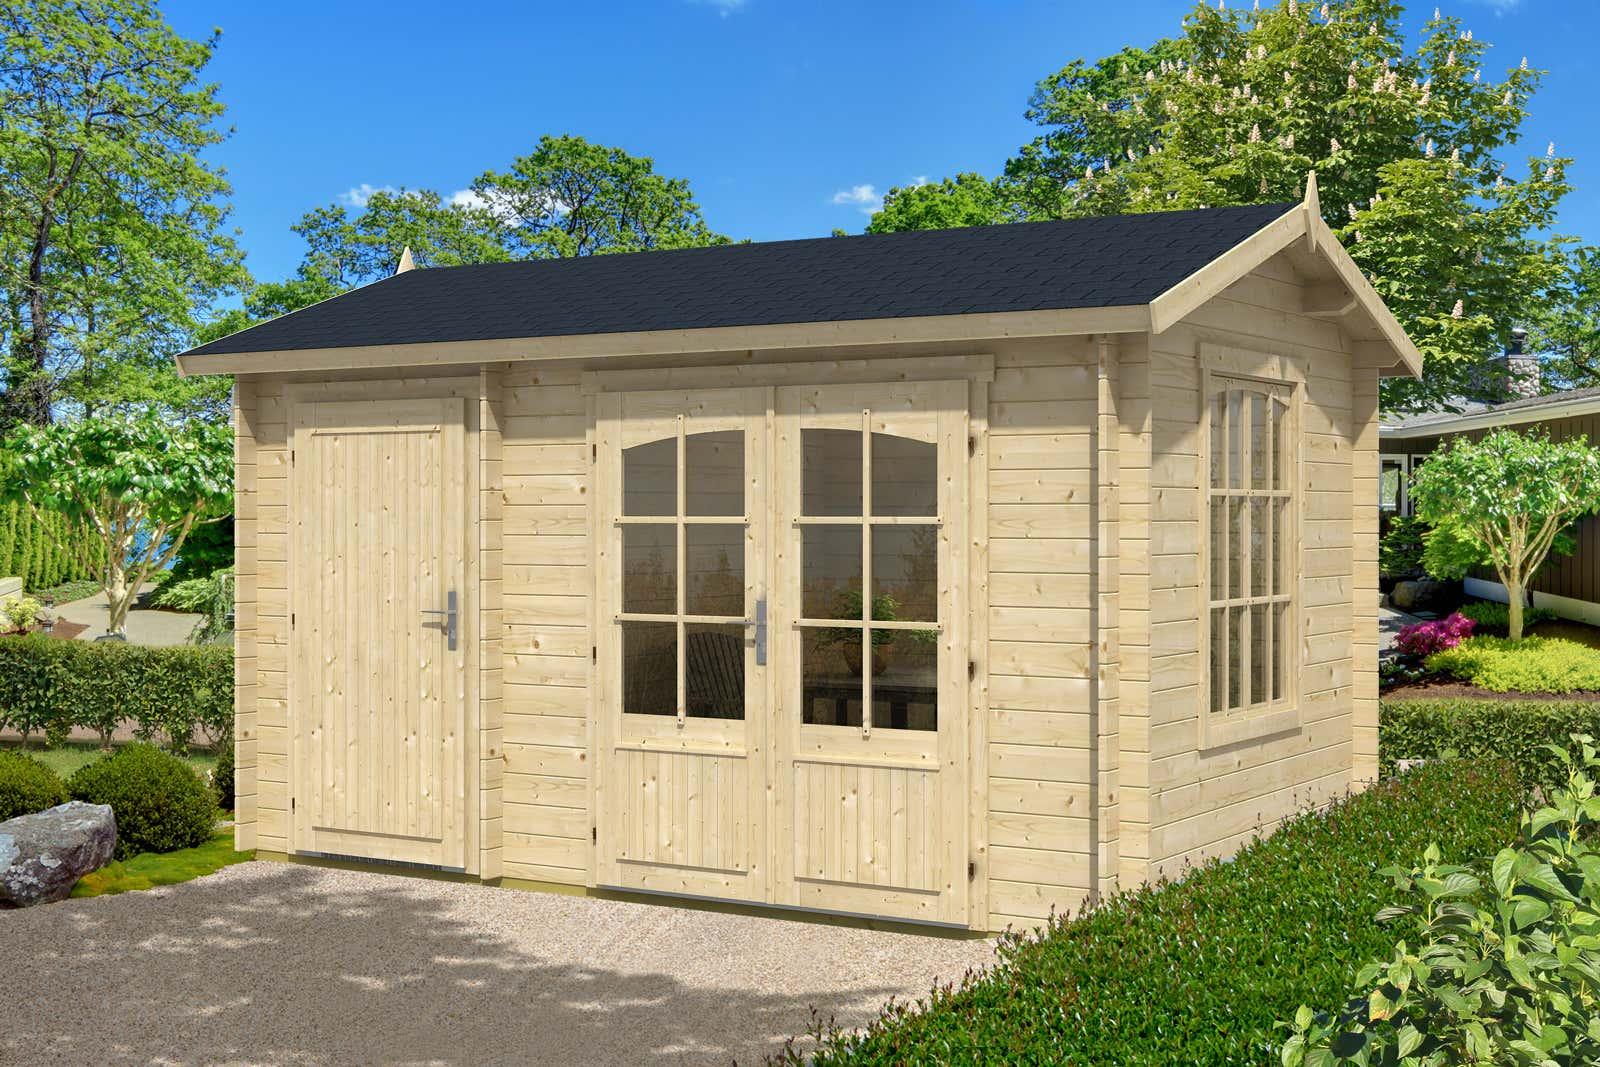 2 raum gartenhaus bolton 28 a z gartenhaus gmbh. Black Bedroom Furniture Sets. Home Design Ideas